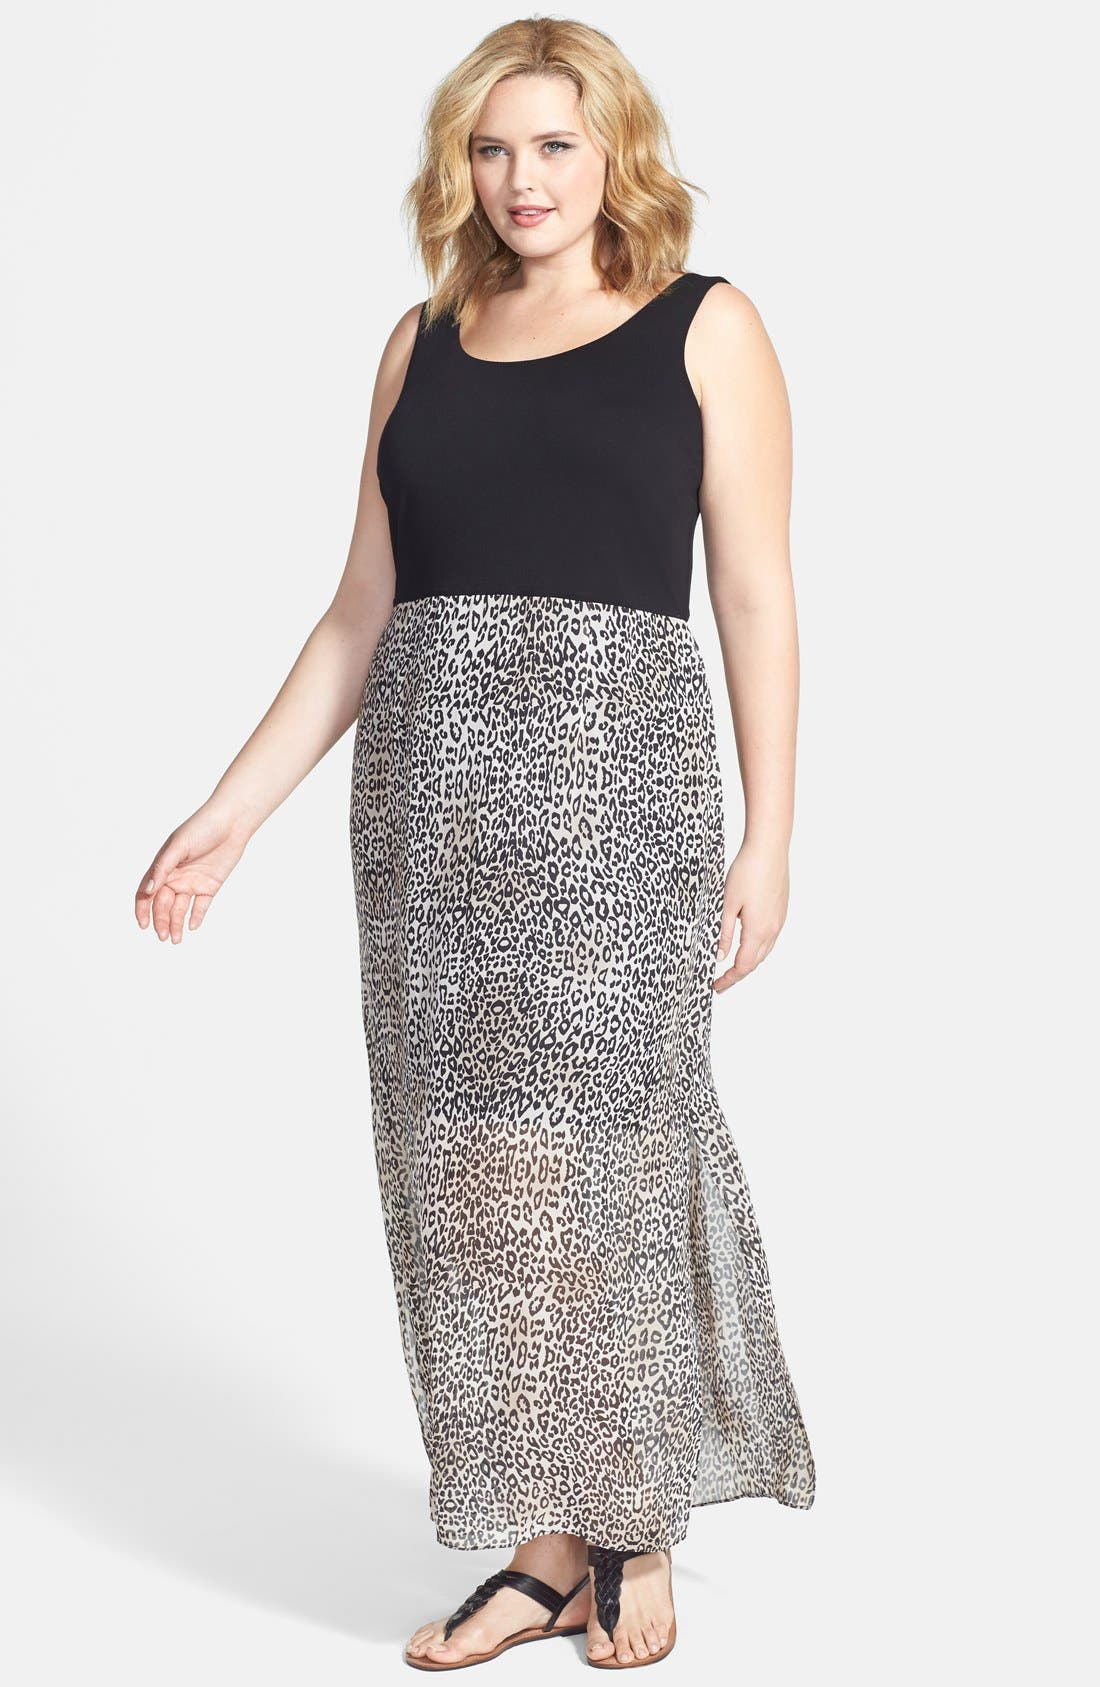 Alternate Image 1 Selected - Vince Camuto 'Desert Leopard' Chiffon Overlay Maxi Dress (Plus Size)